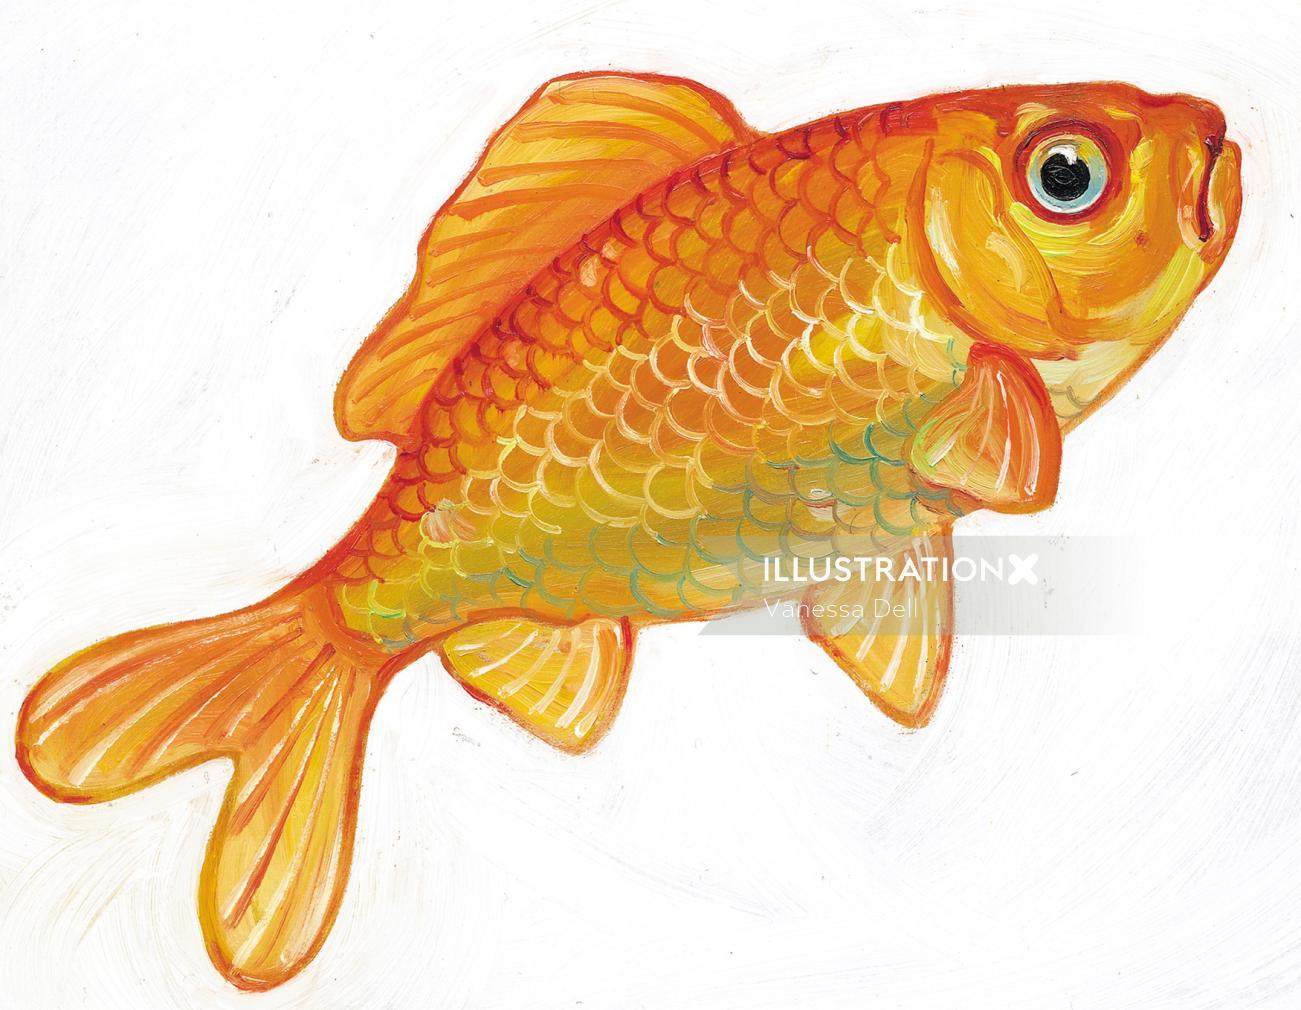 colorfill art of Goldfish